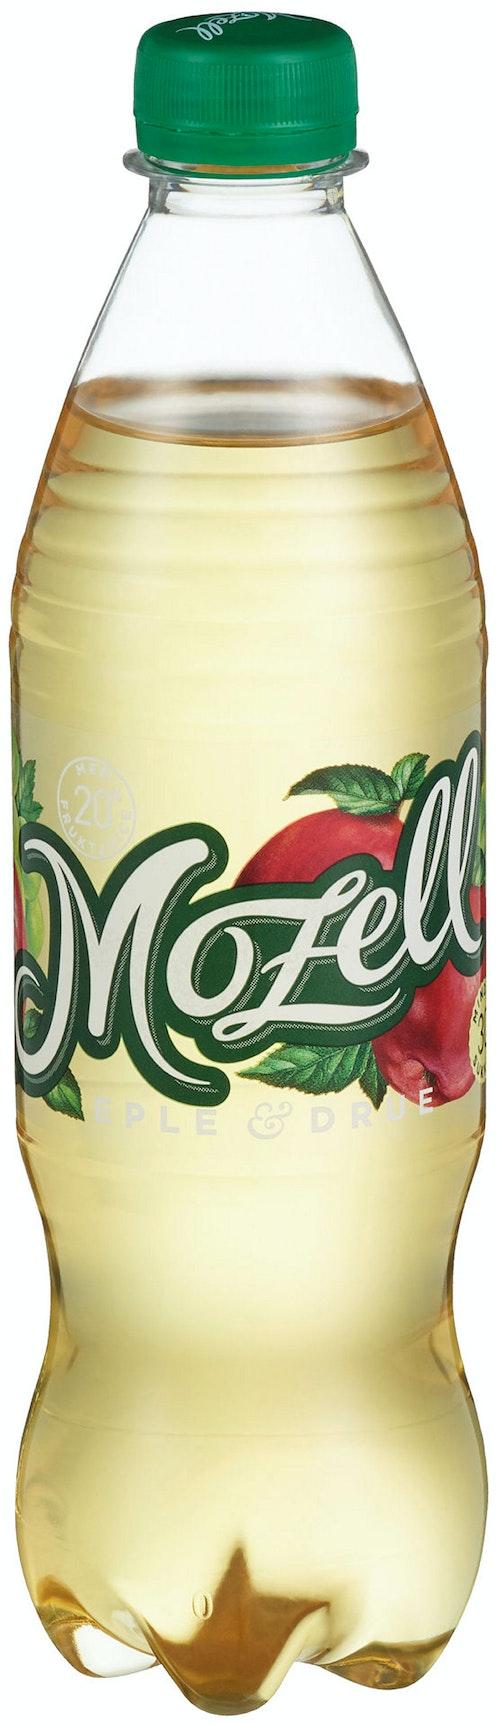 Ringnes Mozell Eple & Drue 0,5 l